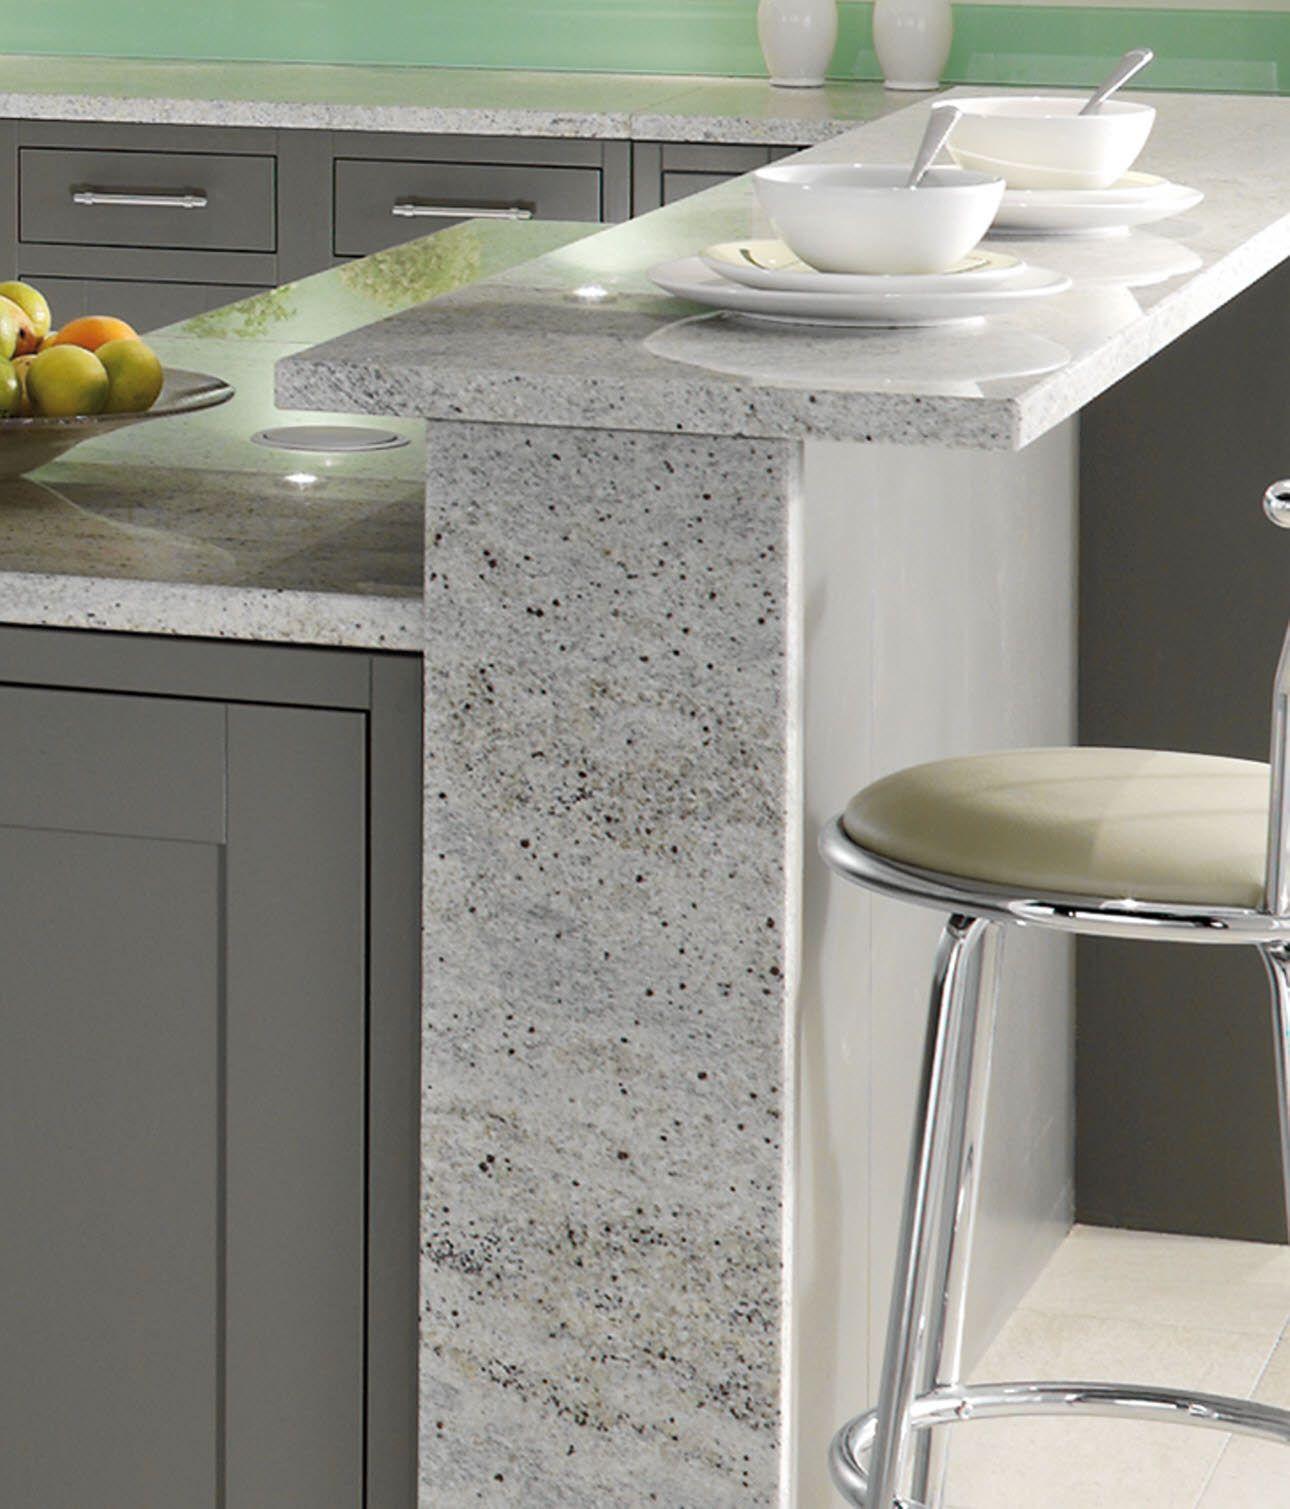 Choosing The Best Kitchen Worktops With Images Granite Worktop Kitchen Open Plan Kitchen Living Room Kitchen Worktop